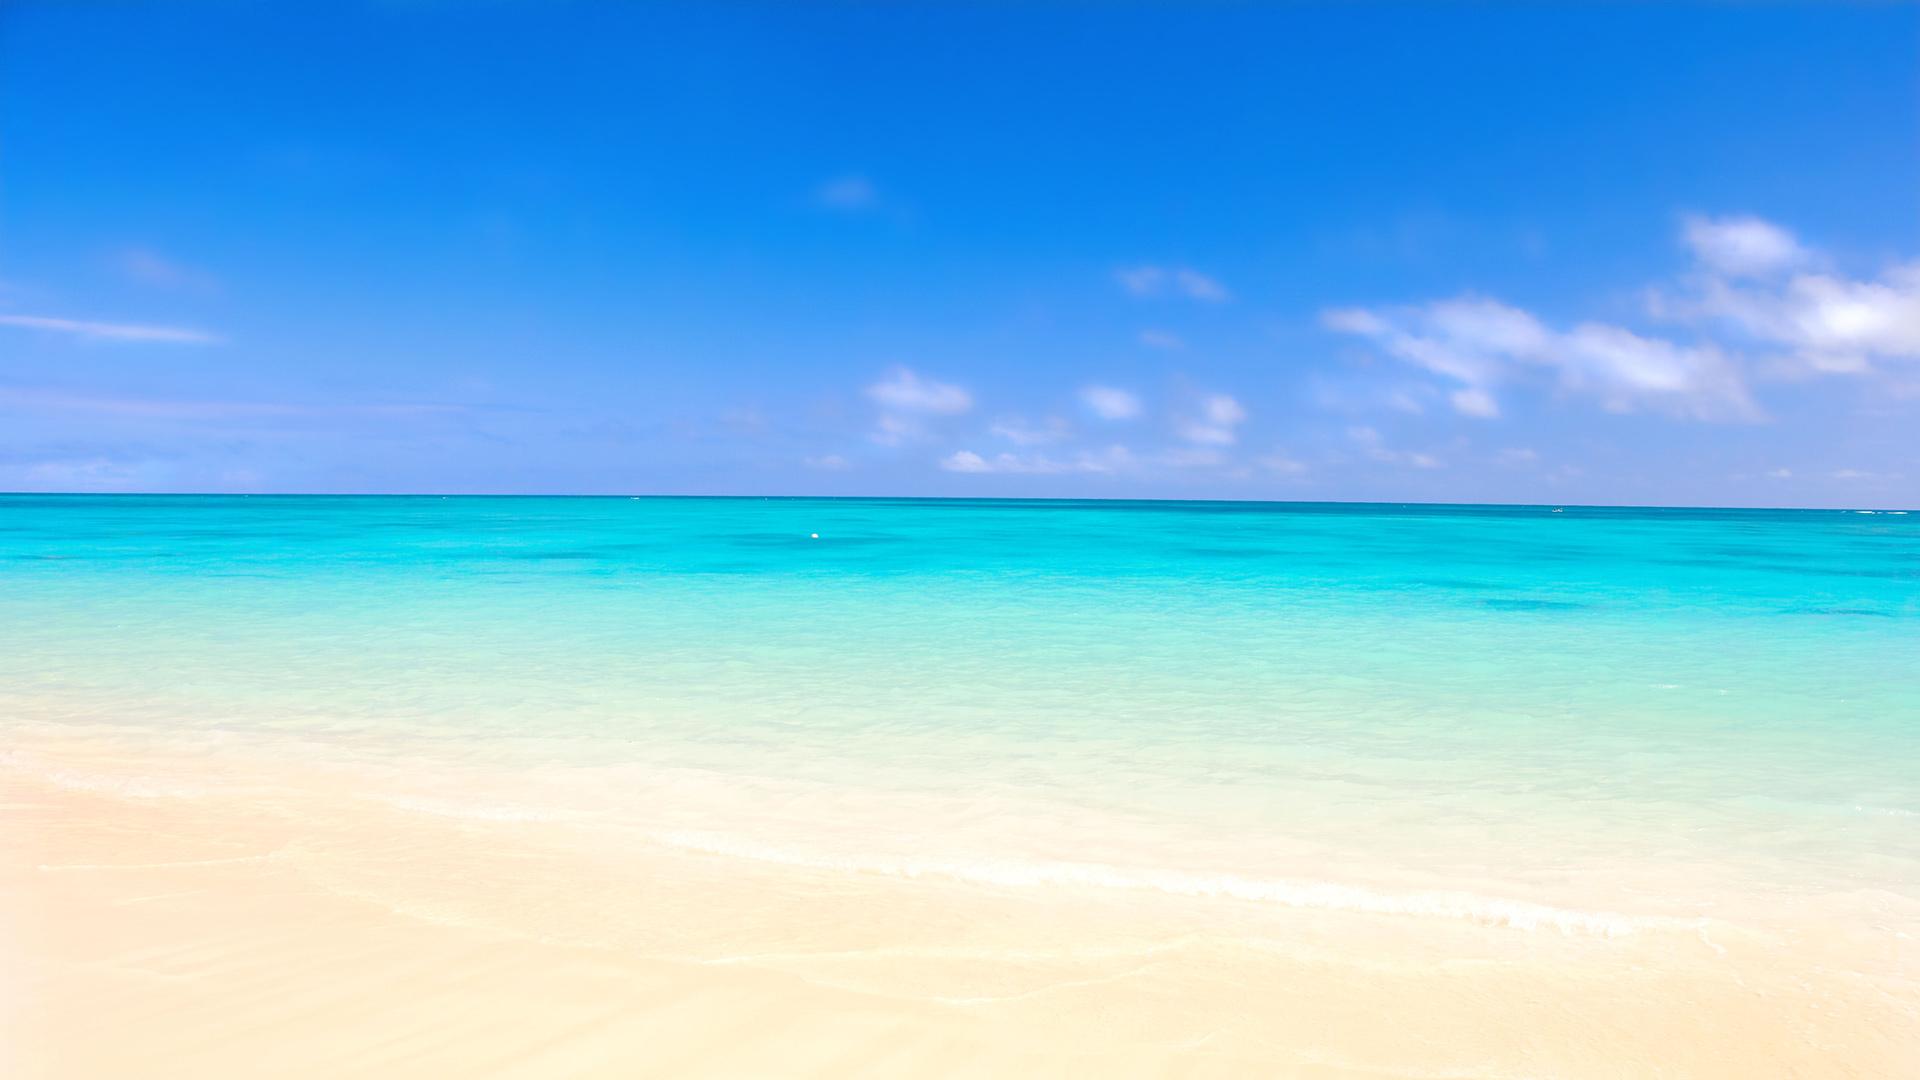 sky sea beaches - photo #35